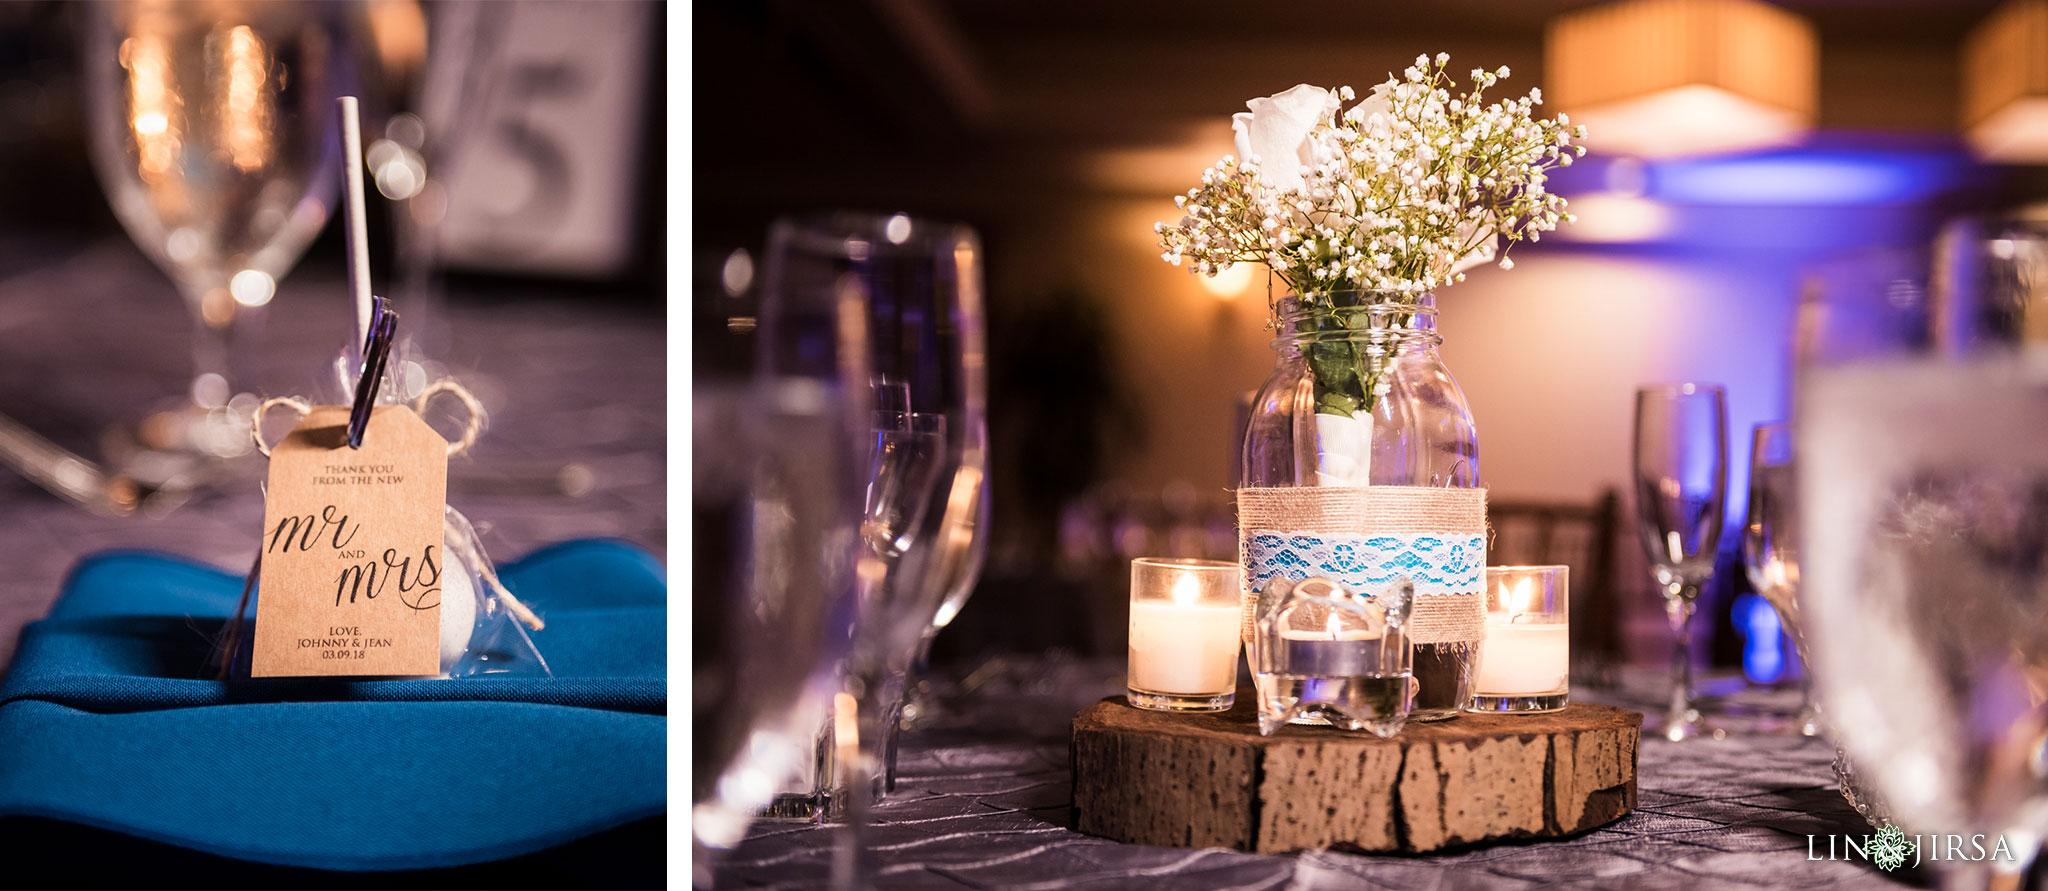 29 turnip rose promenade orange county wedding reception photography